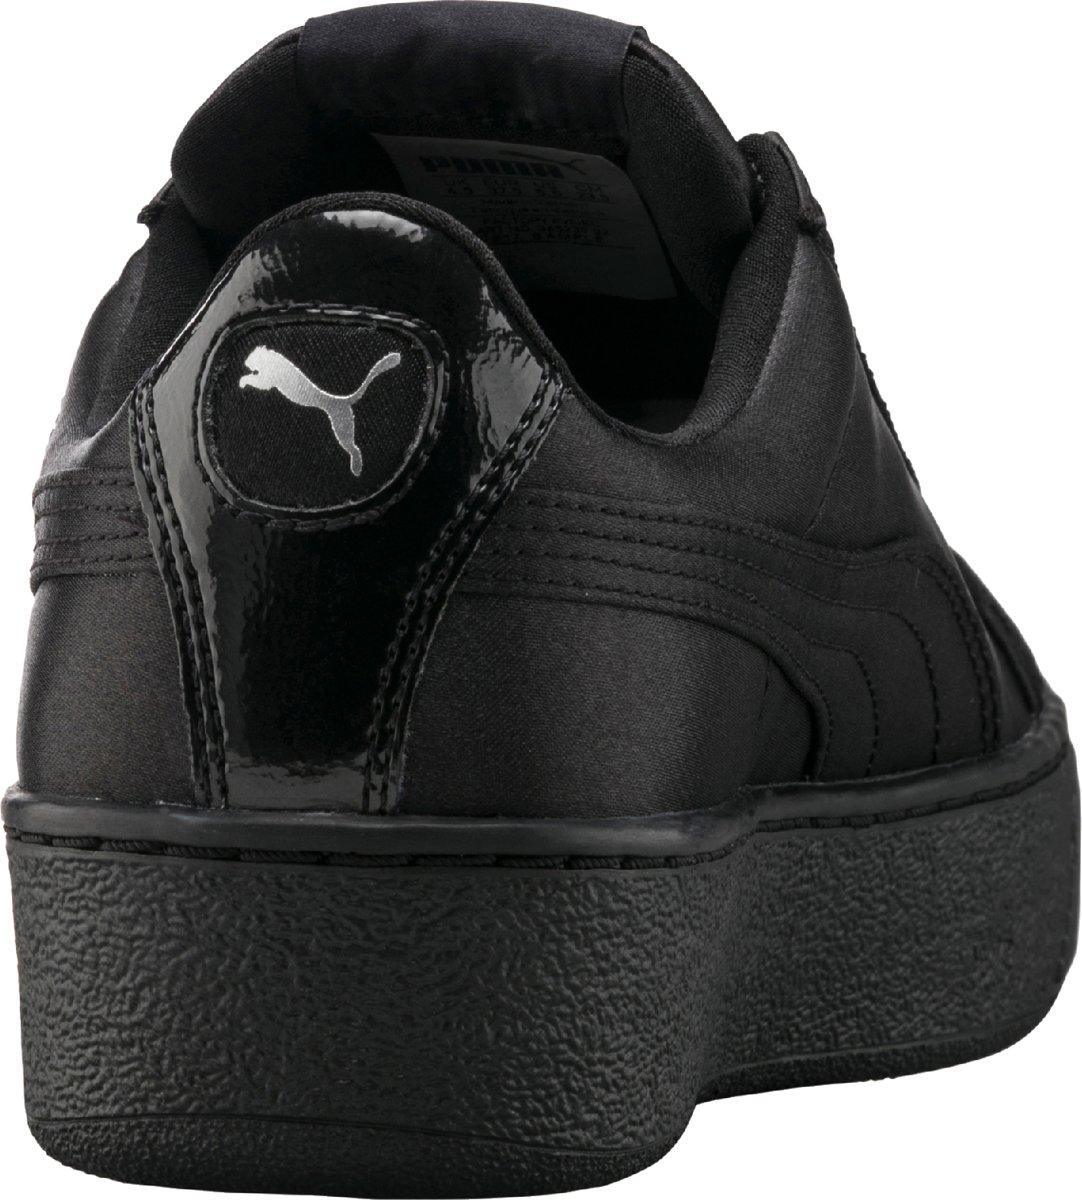 PUMA Sneakers Dames Vikky Platform EP 365239 02 Black Black